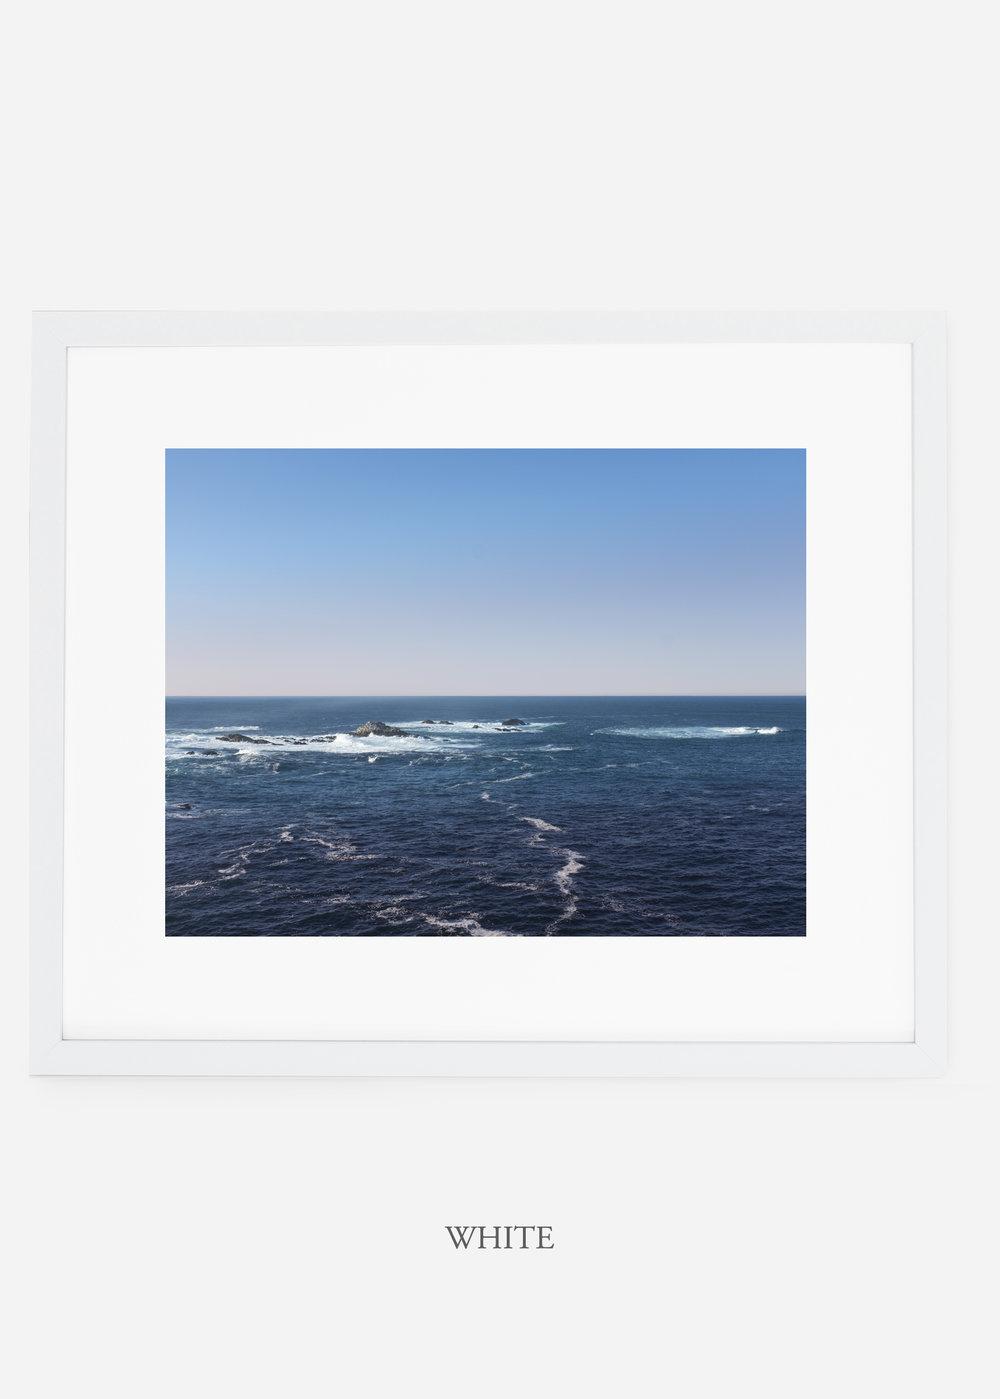 WilderCalifornia_whiteframe_interiordesign_oceanprint_PacificOceanNo.1.jpg